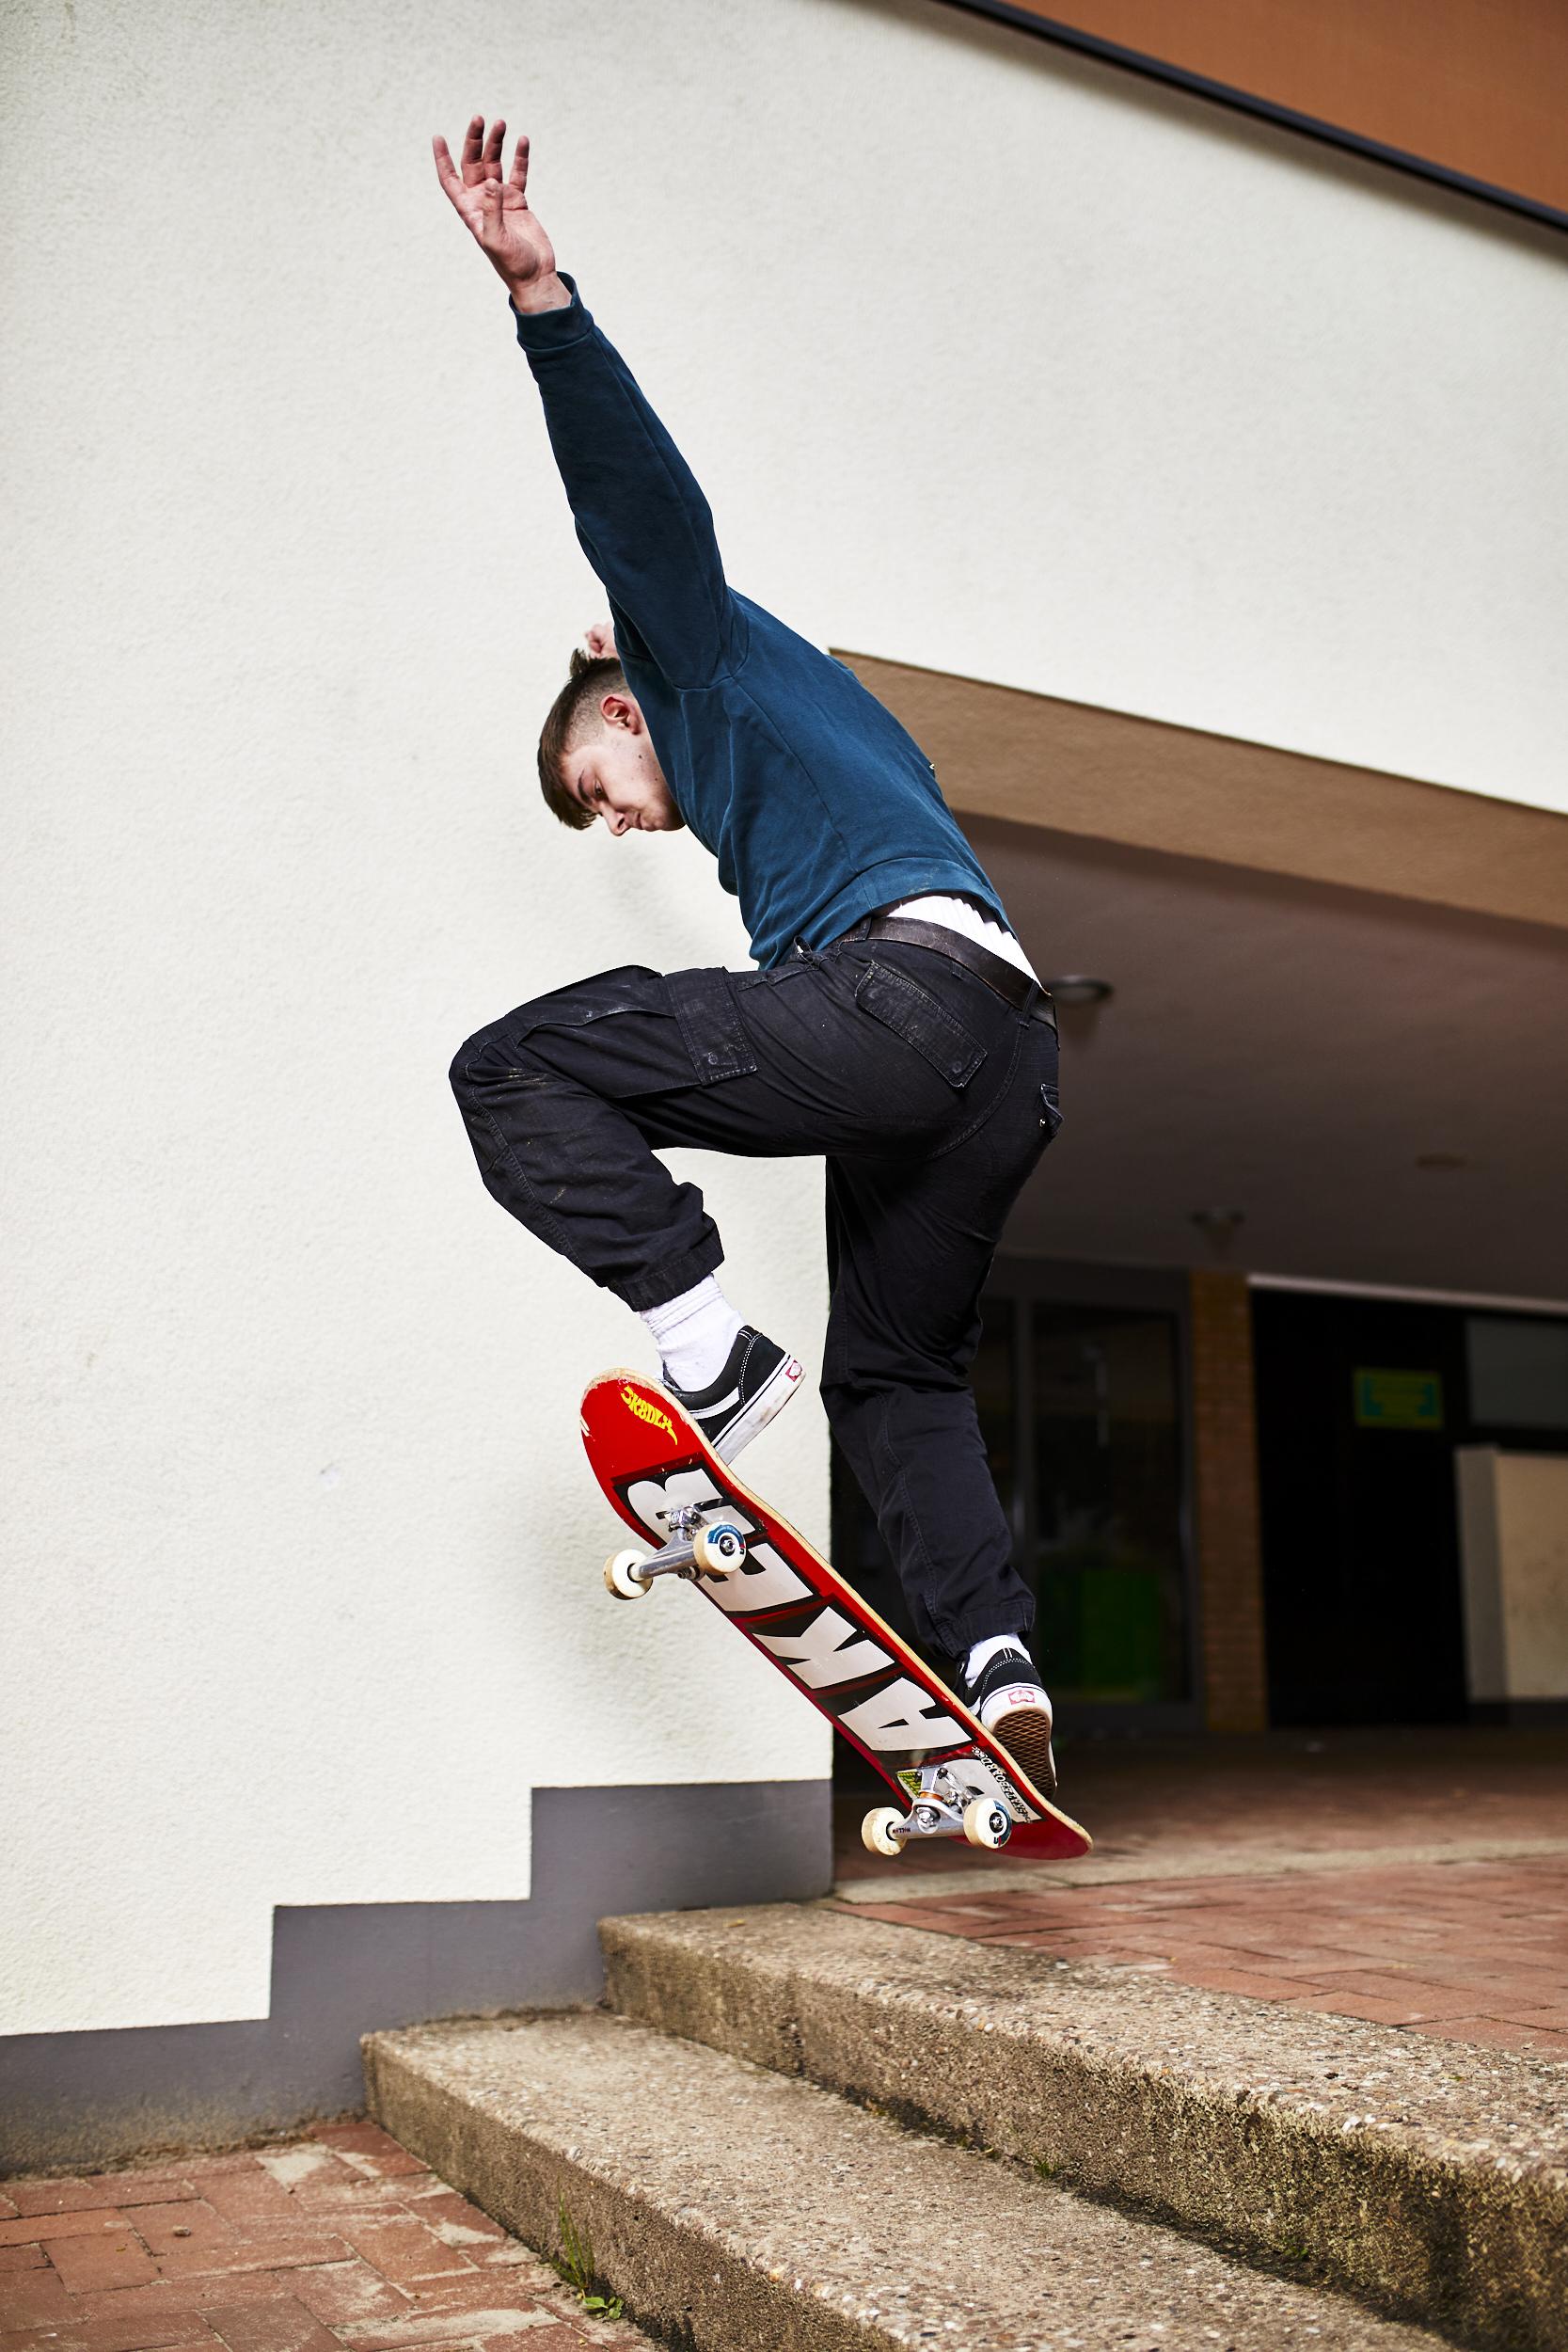 MARTINRUPIK_2021-05-23_Justin-Skate0007